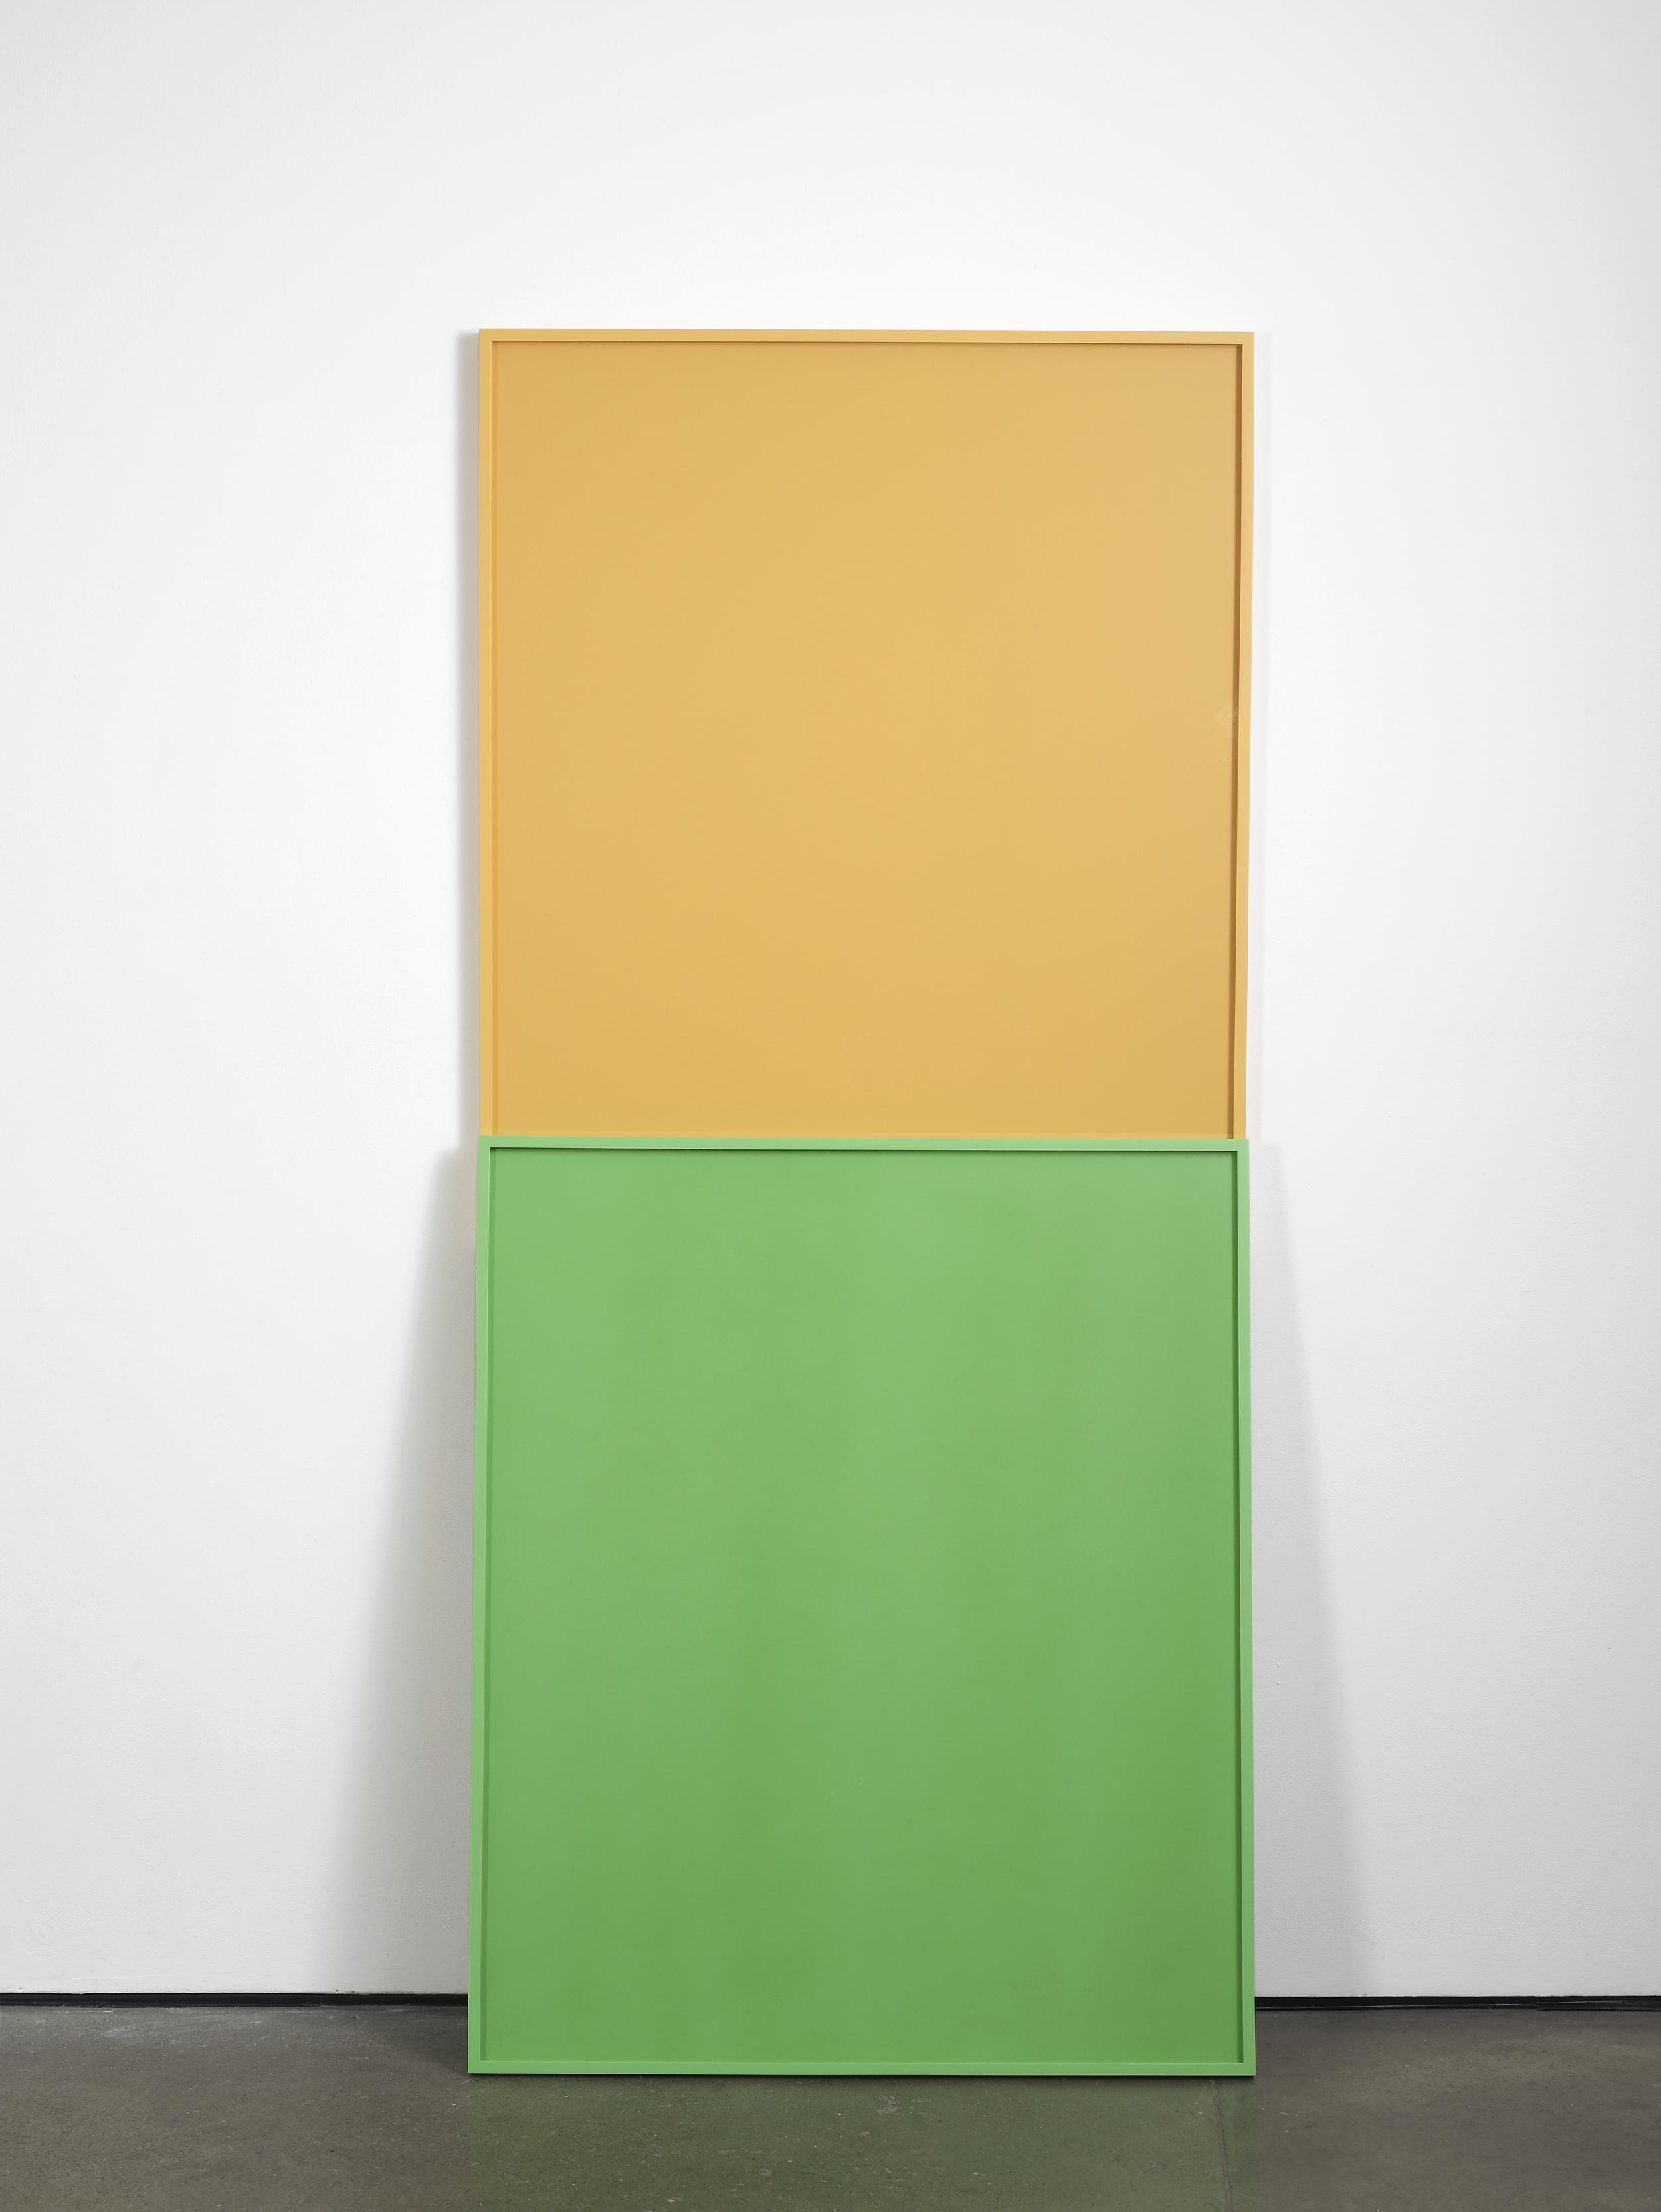 Matt Connors Folkways (second version) 2012 Two artist frames 2 parts, each part: 122 x 102 cm / 48 x 40.1 in